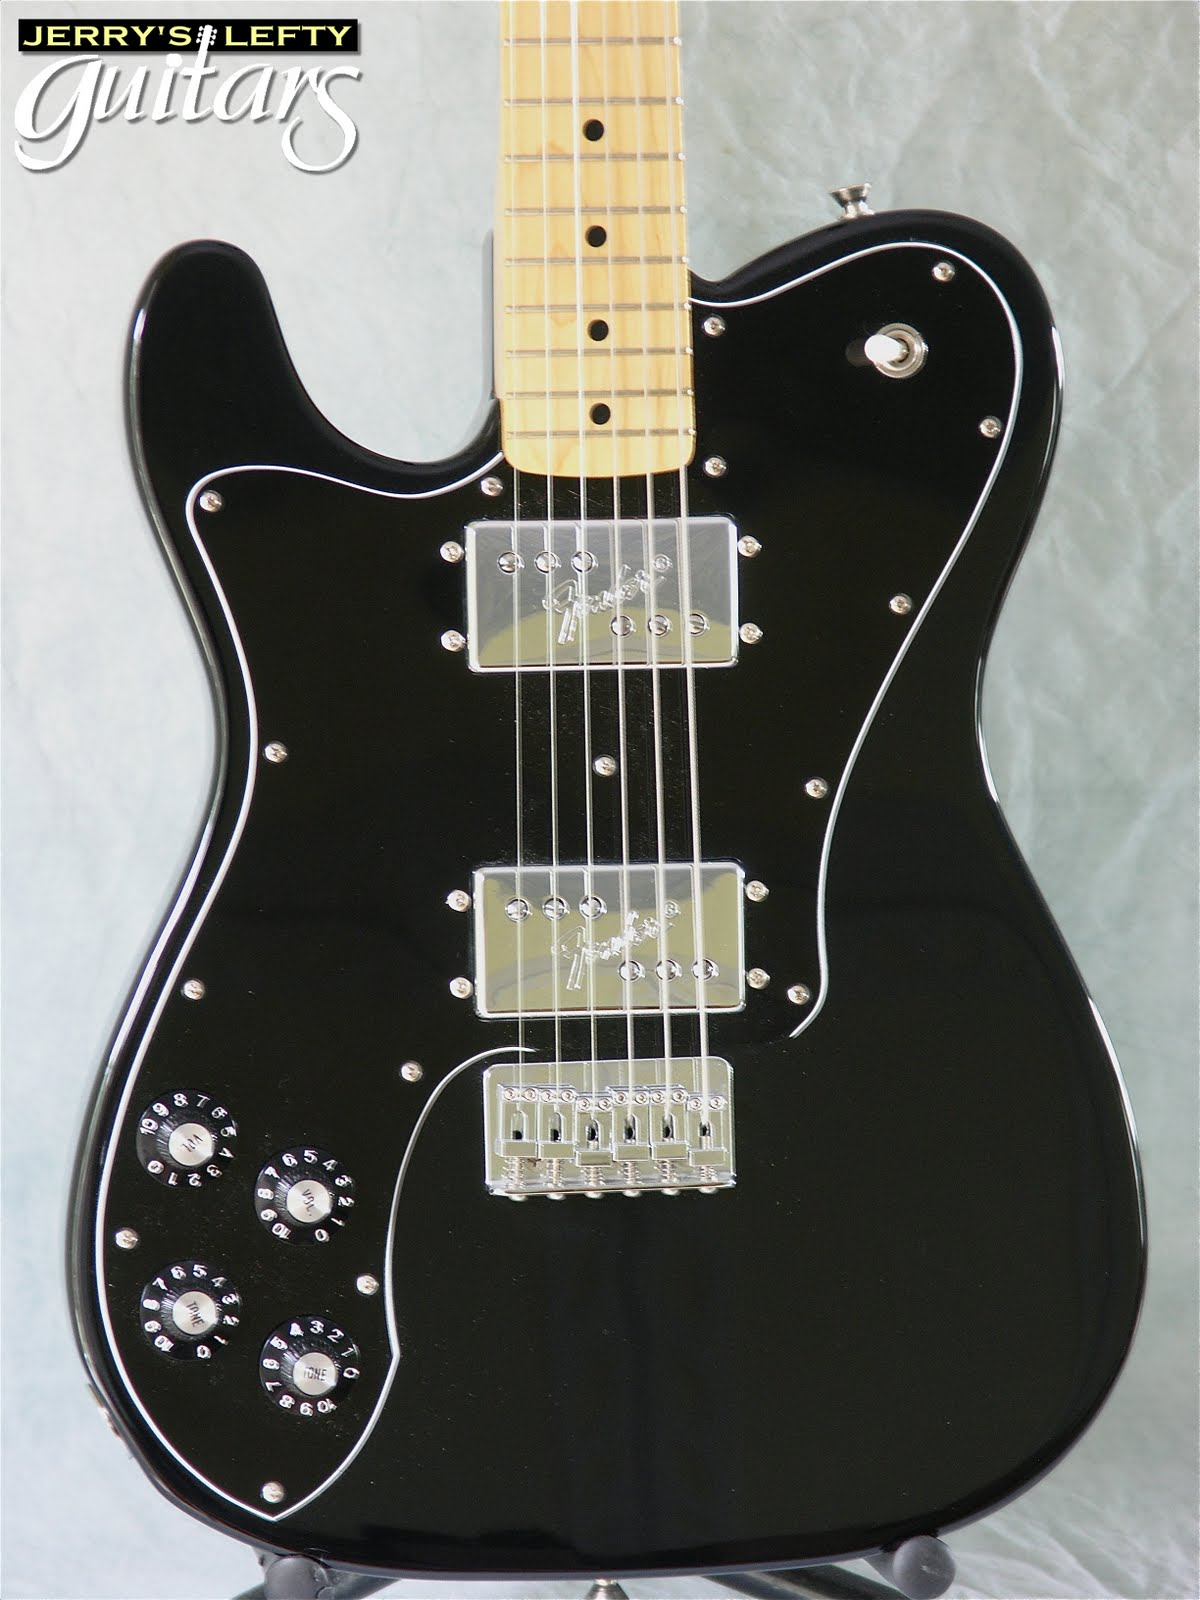 jerry 39 s lefty guitars newest guitar arrivals updated weekly fender cij tele deluxe 39 72ri left. Black Bedroom Furniture Sets. Home Design Ideas